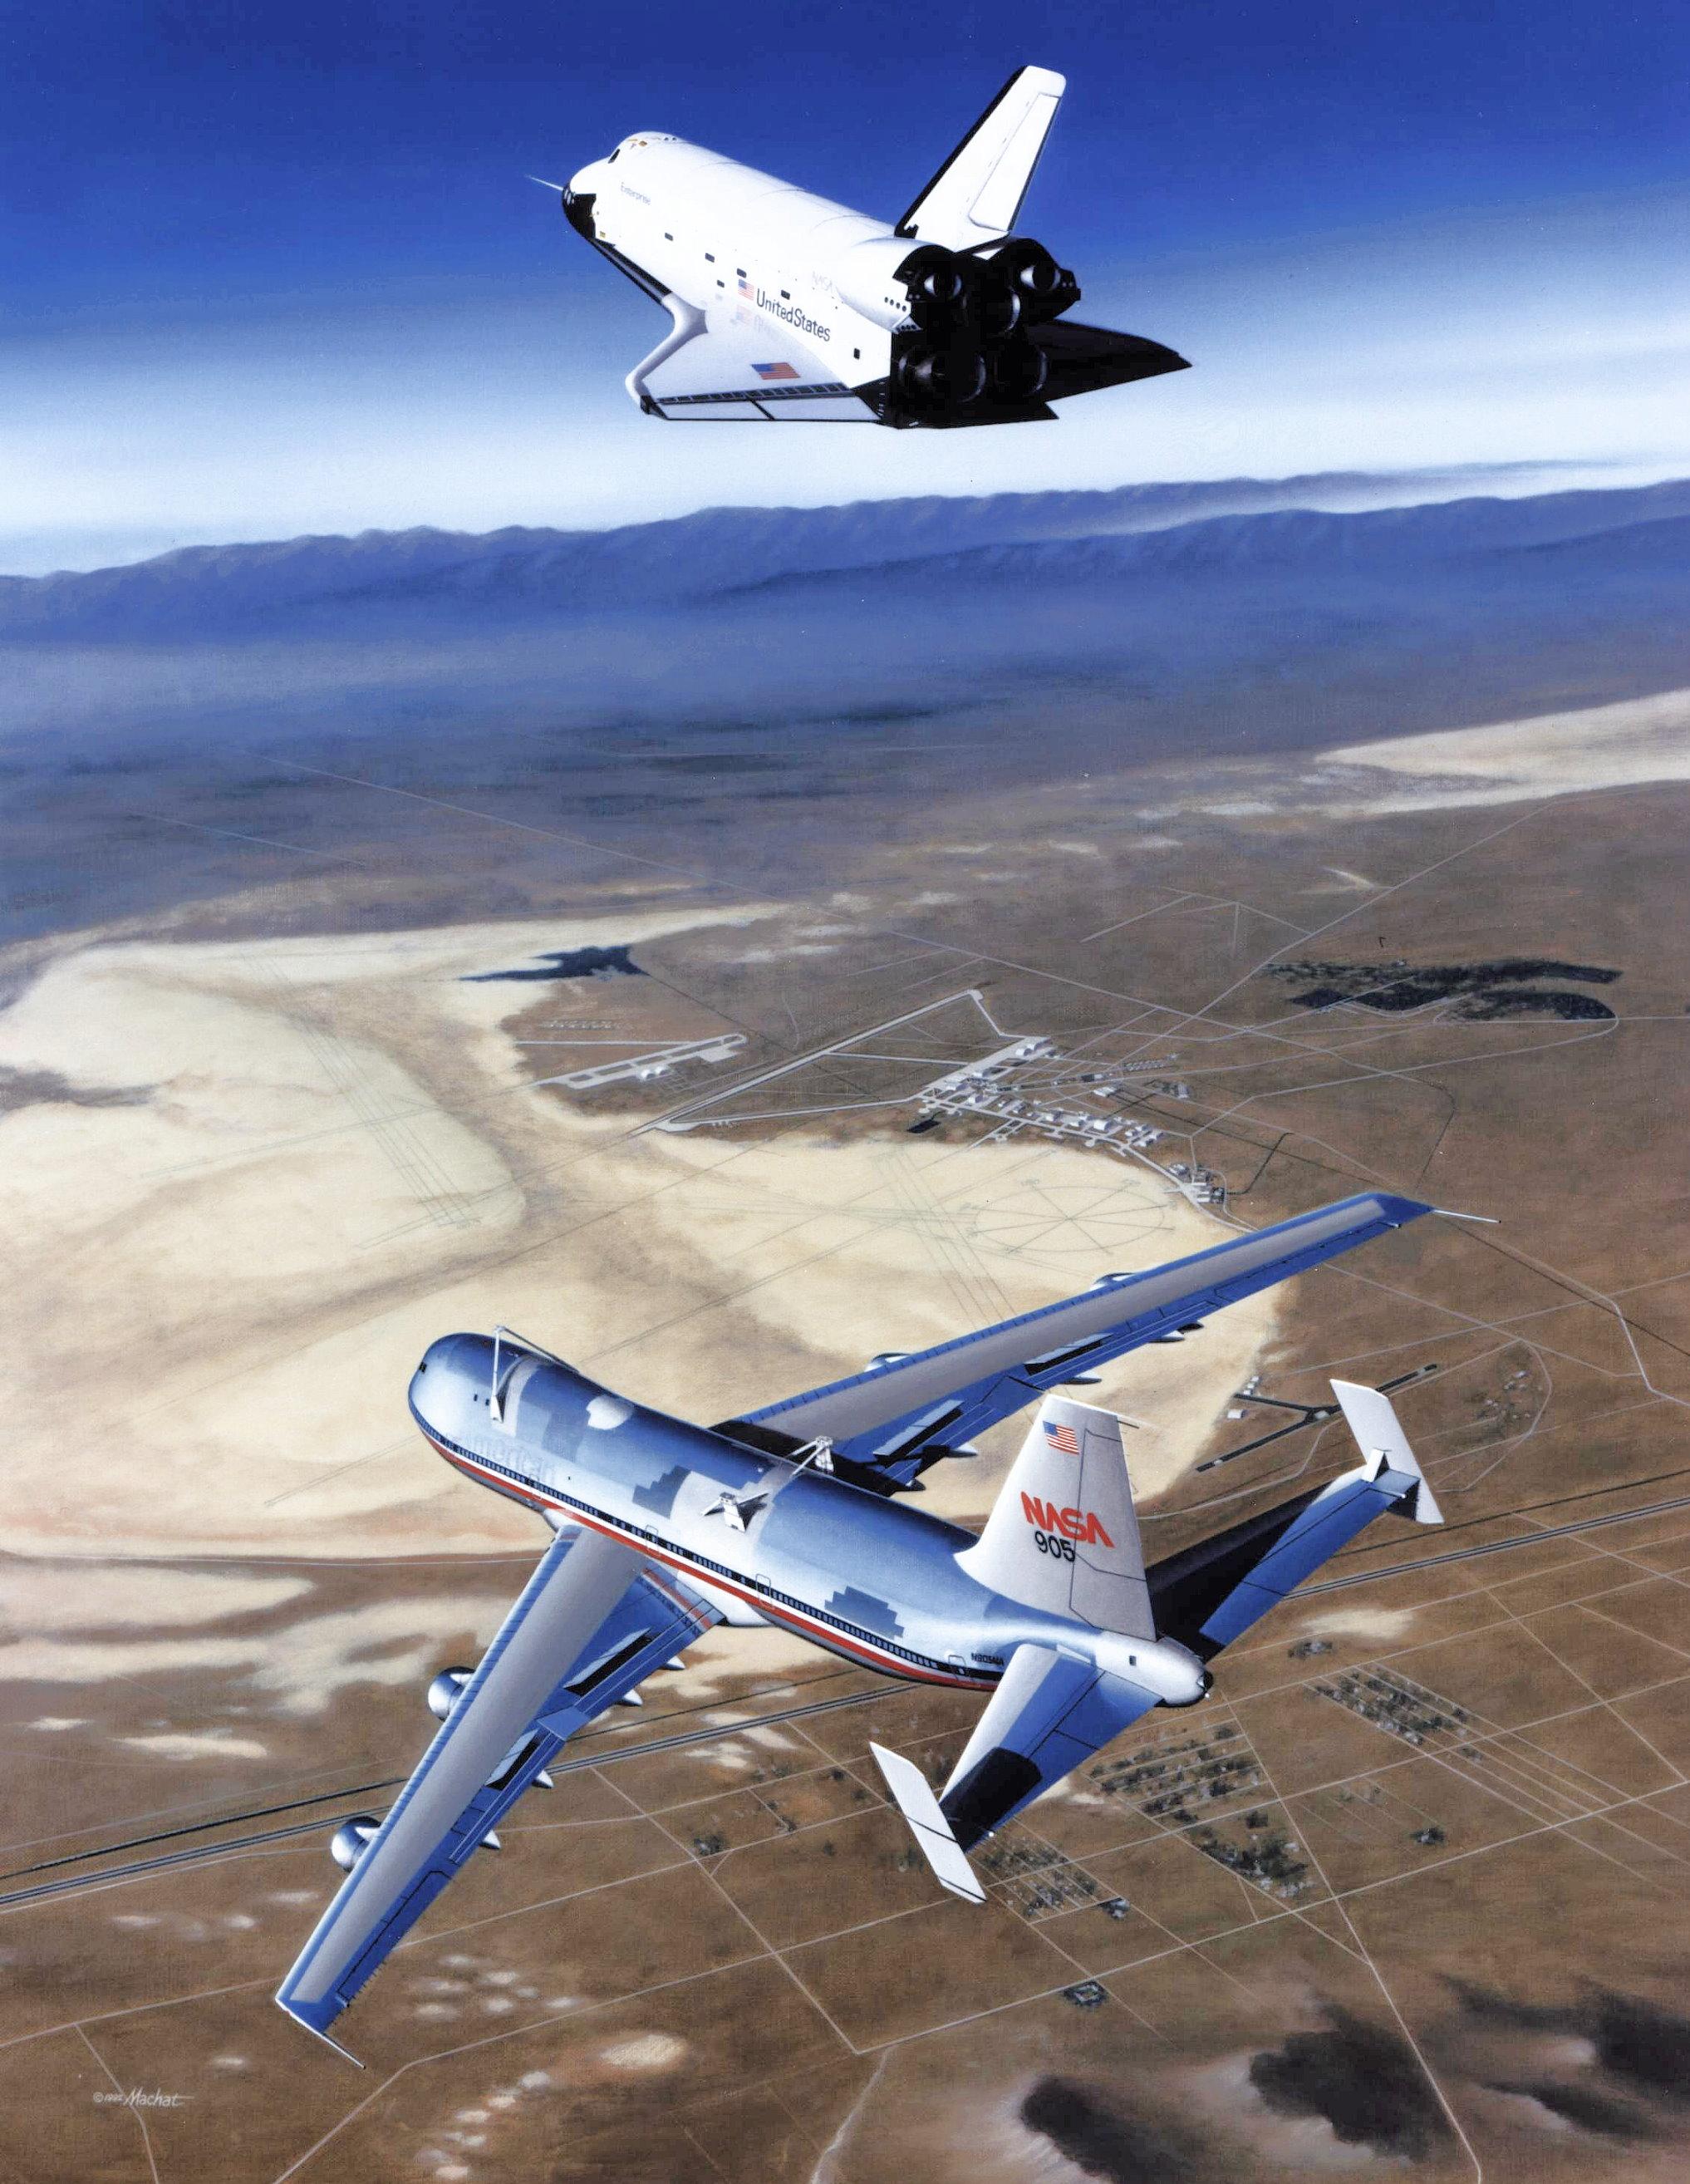 MACHAT 1 shuttle 2002.jpg